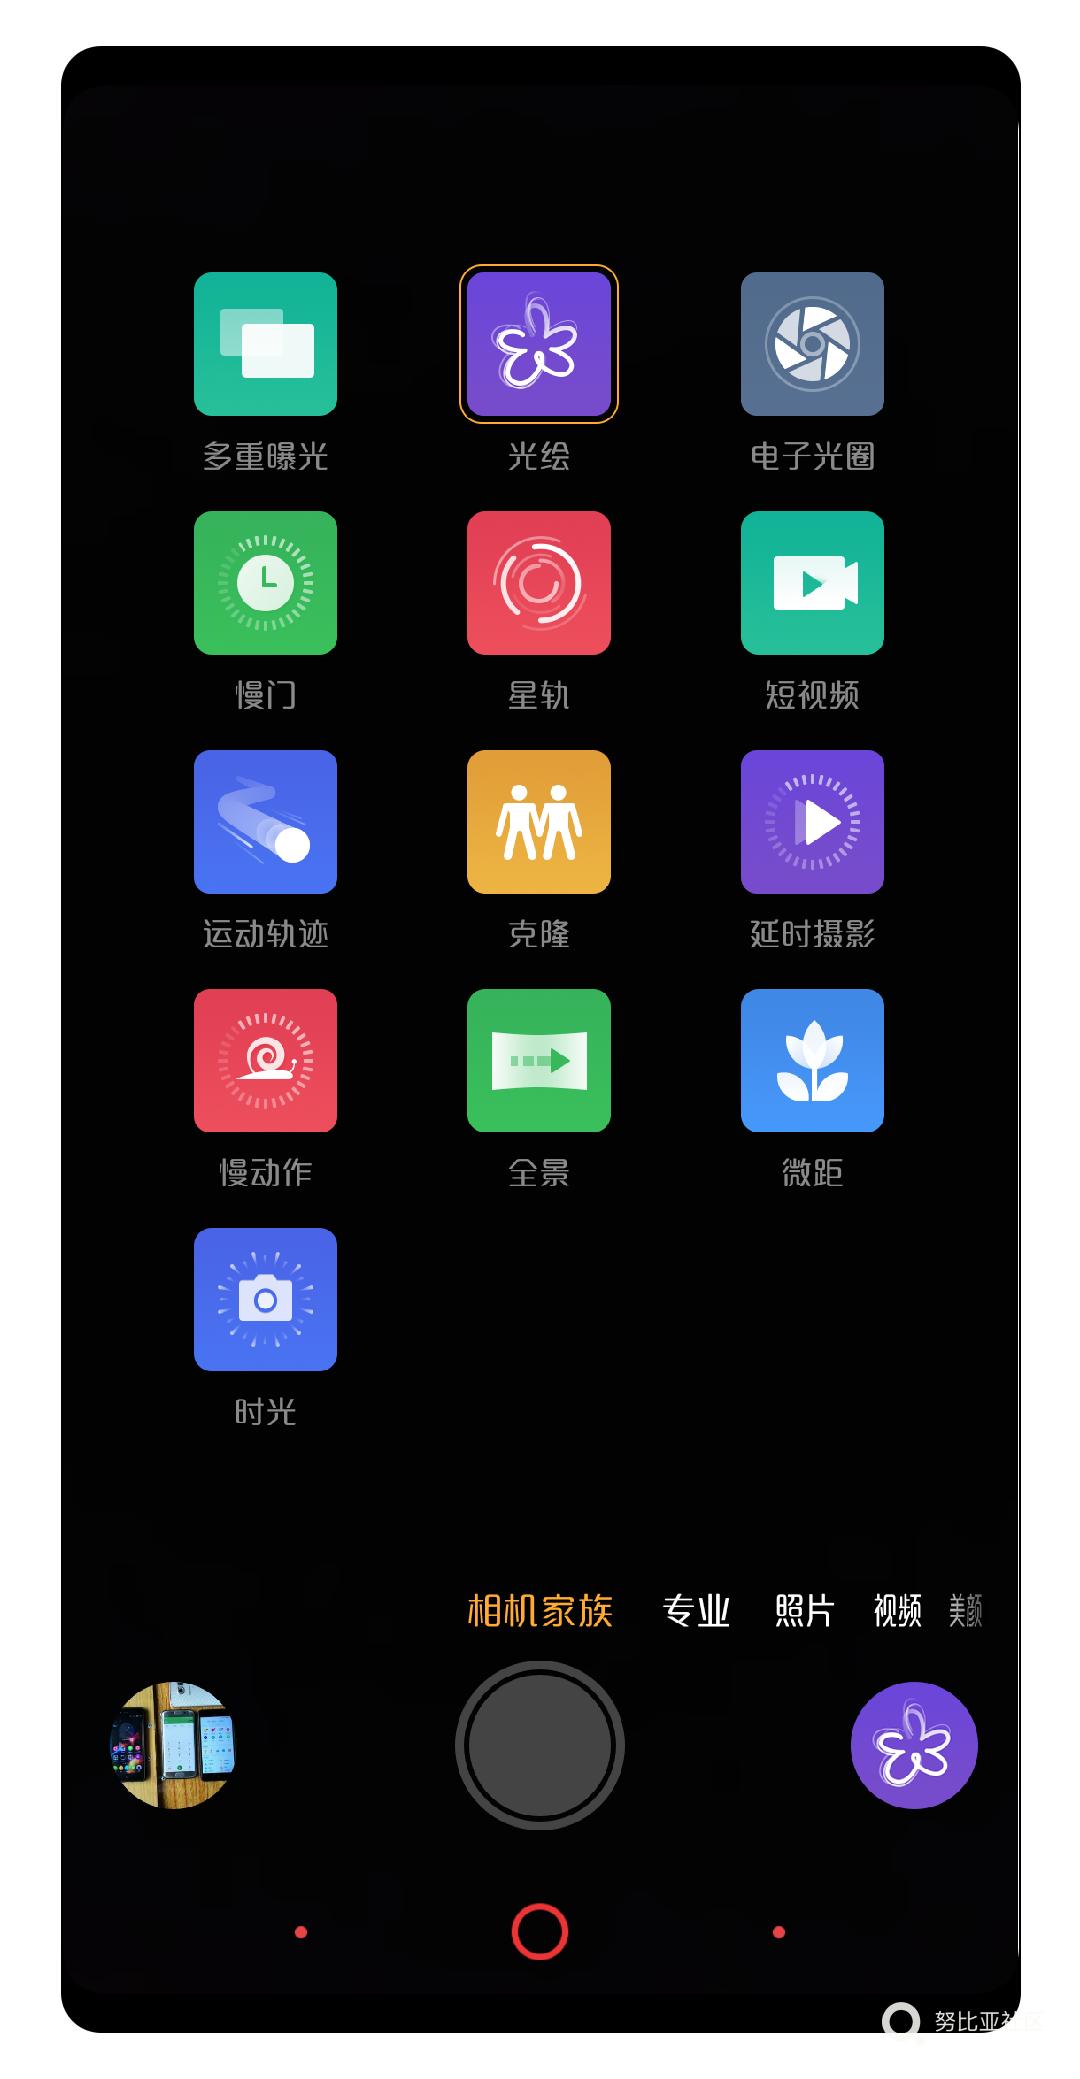 Screenshot_2018-04-14-15-43-11.png